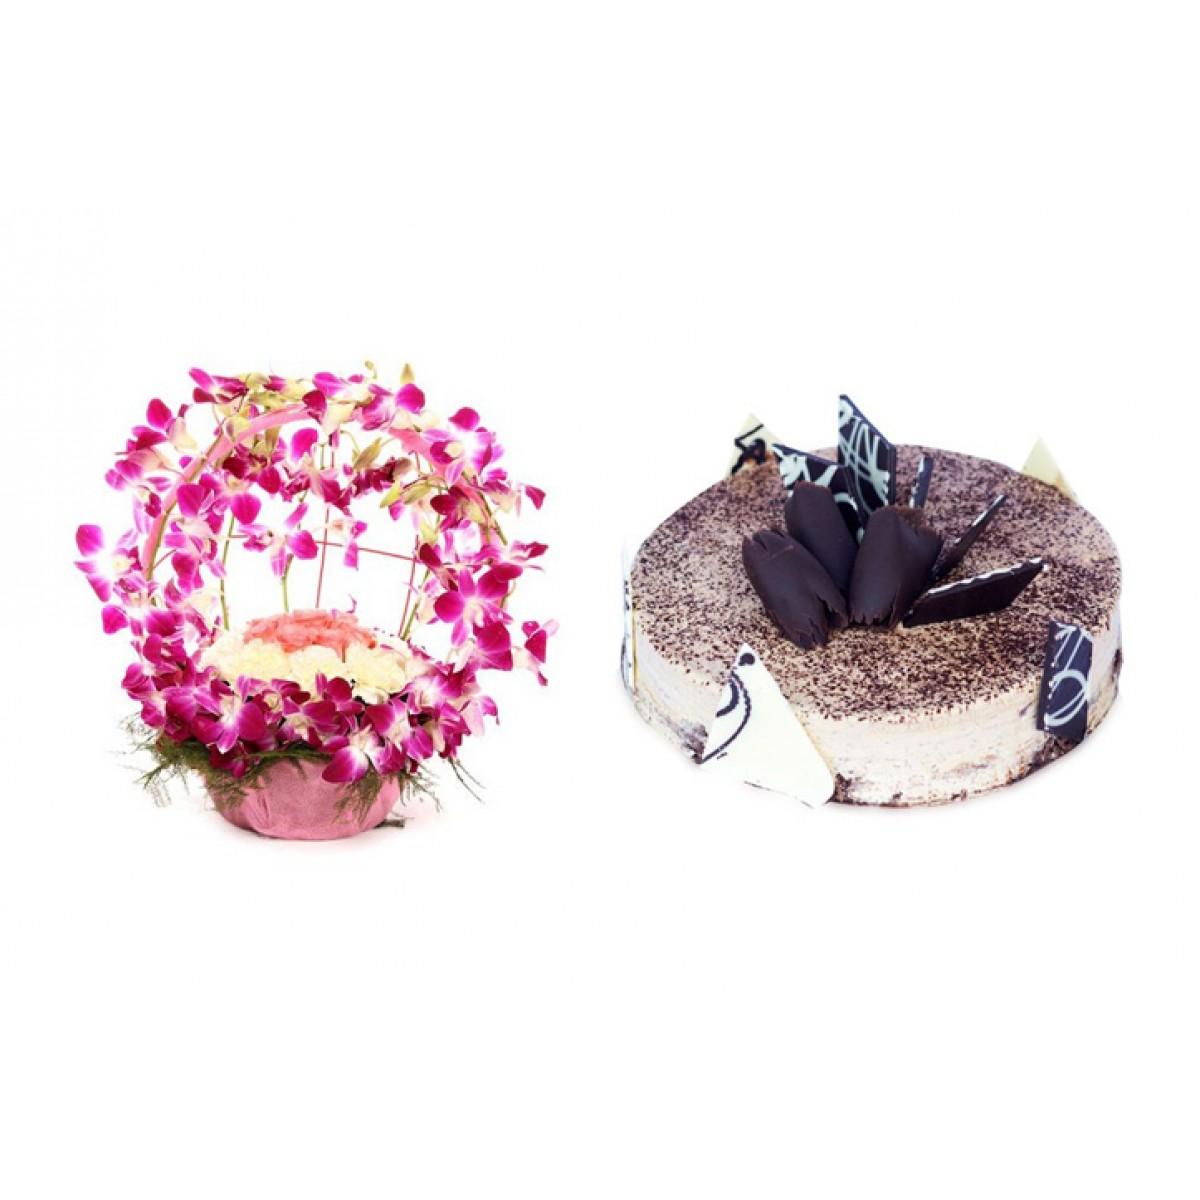 Online wedding gift shopping